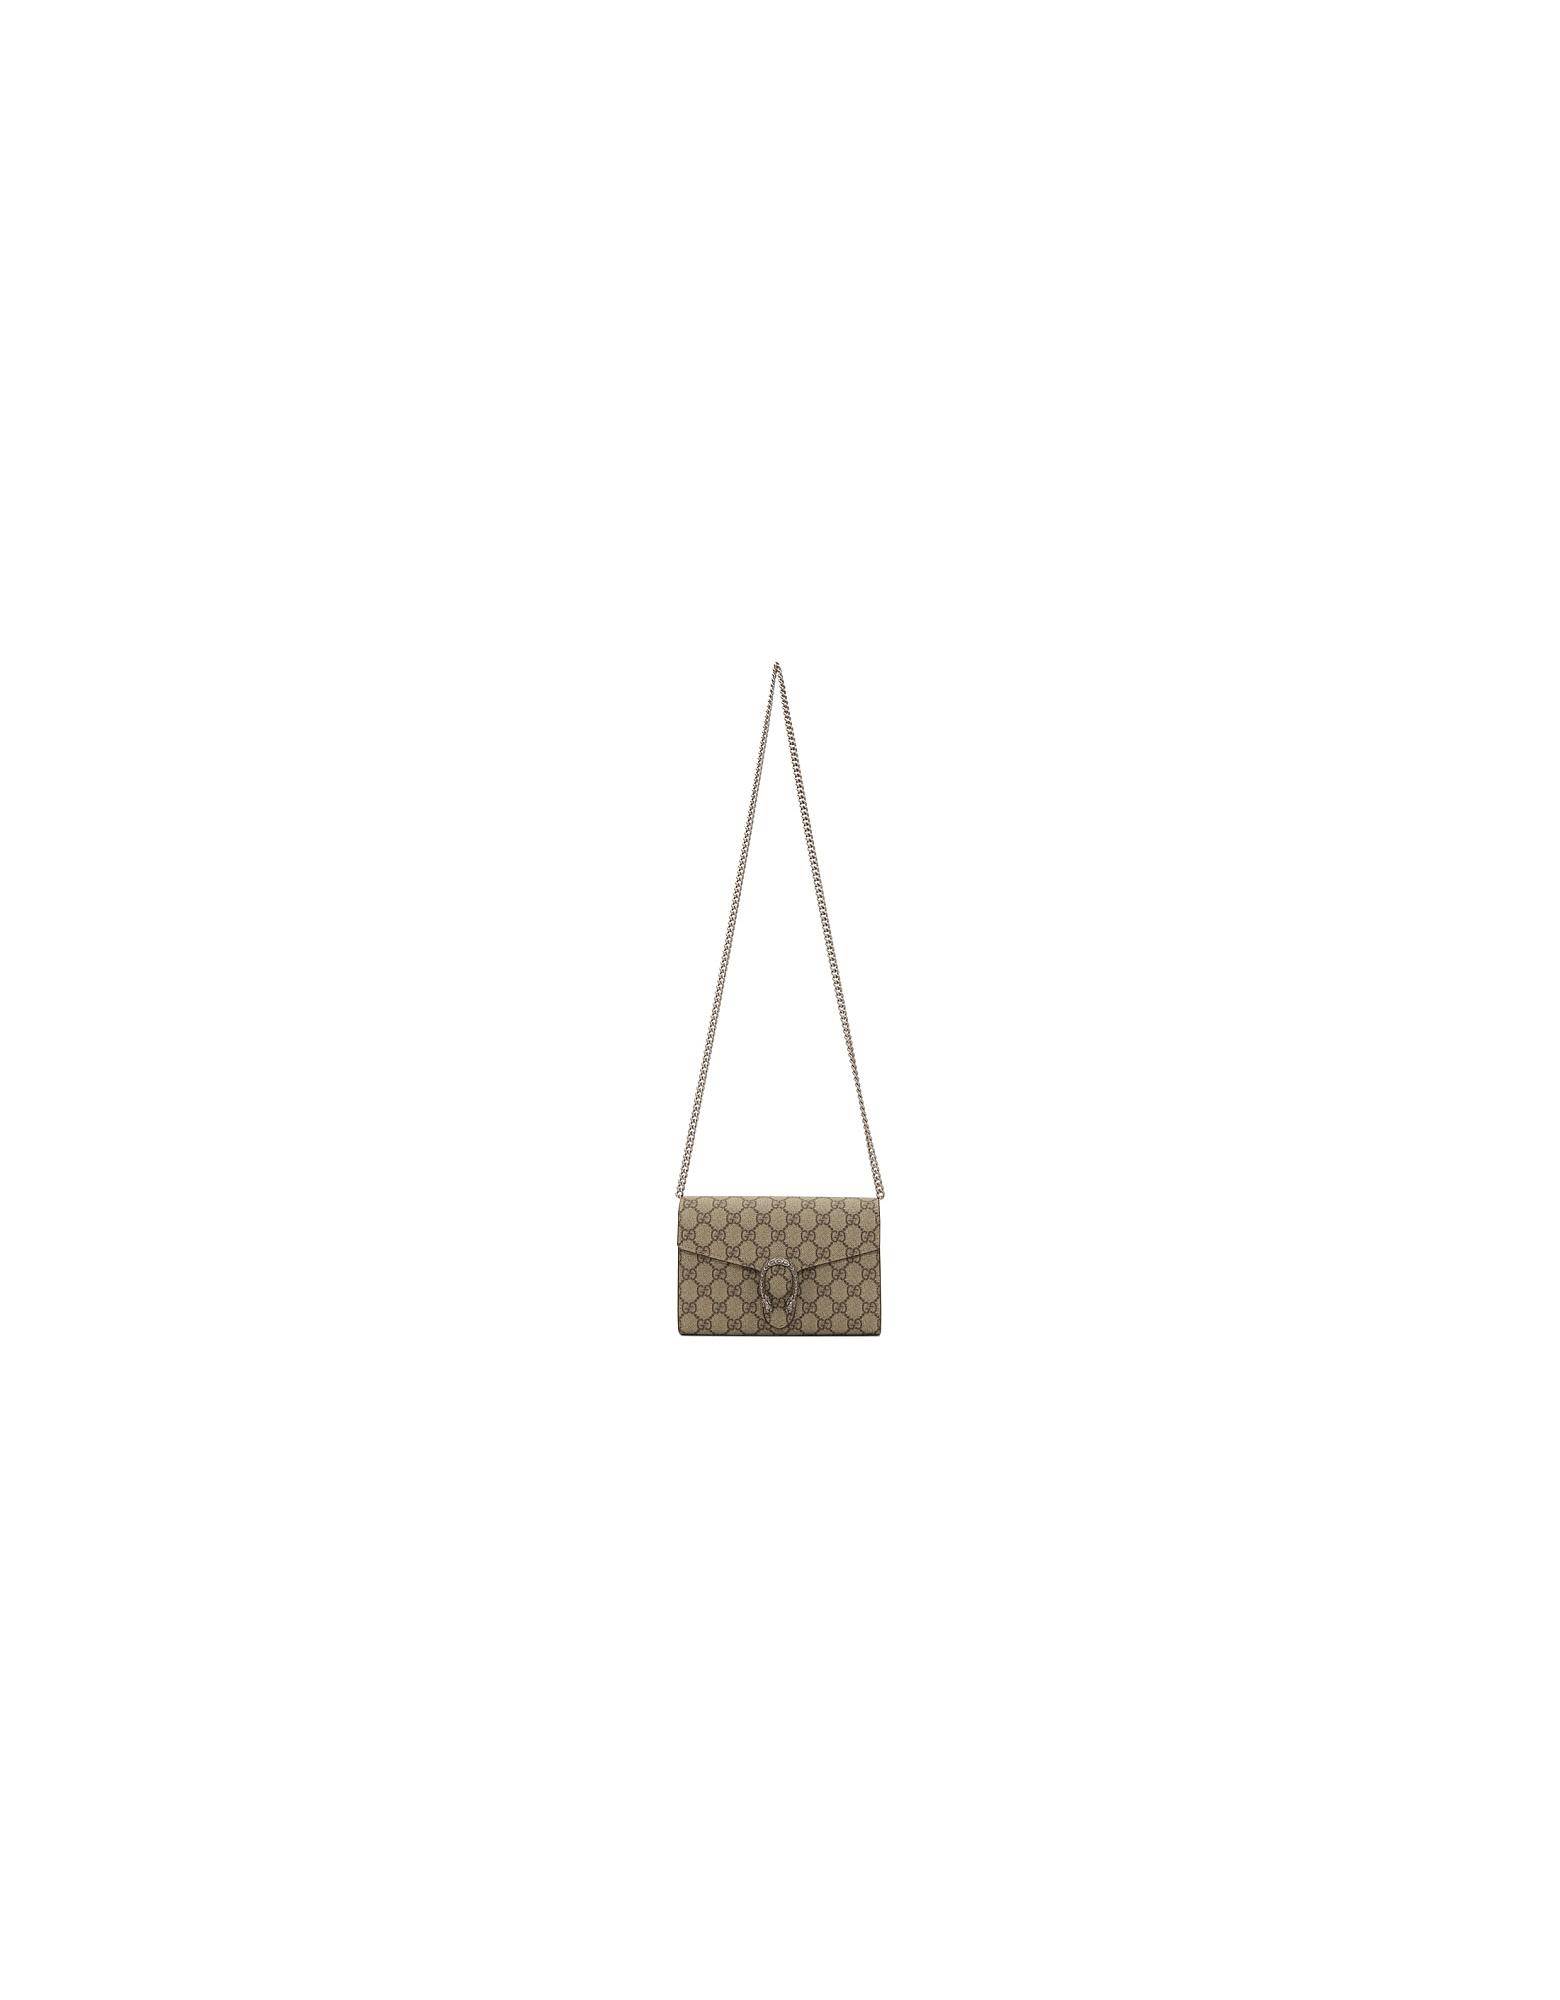 Gucci Designer Handbags, Beige GG Dionysus Wallet Chain Bag